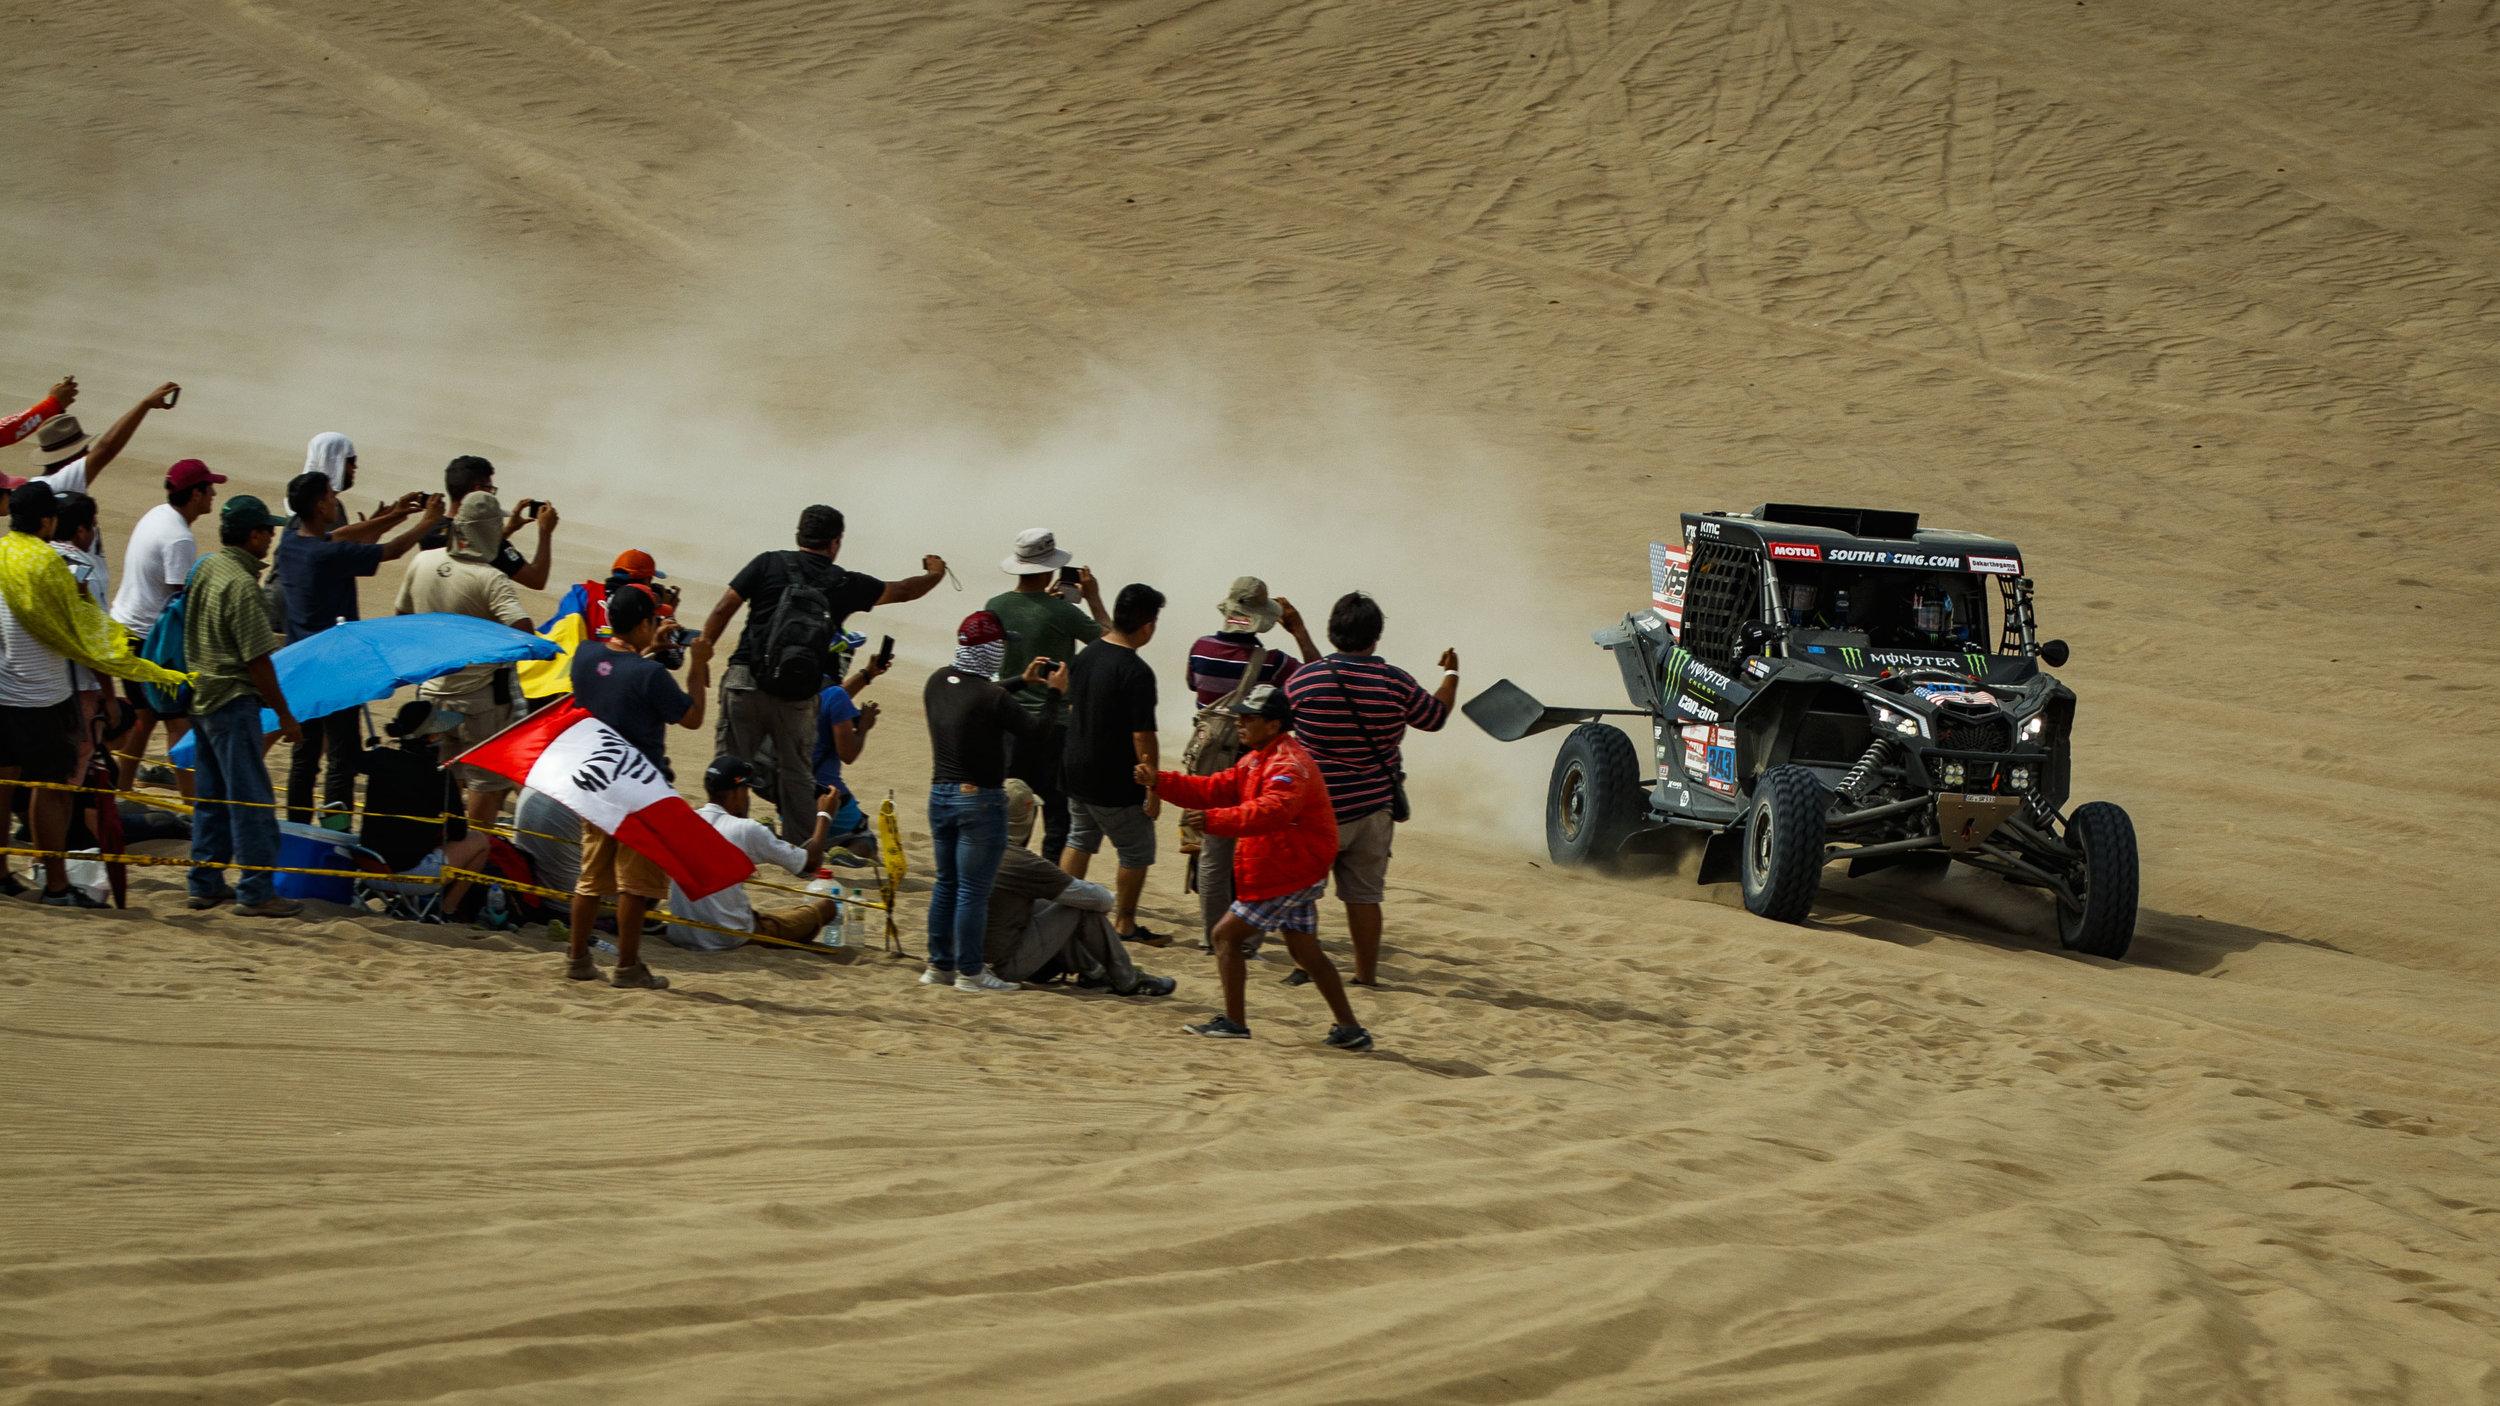 CaseyCurrie_Dakar_PiscoPeru_Stage1_CanAm_16X9_007.jpg